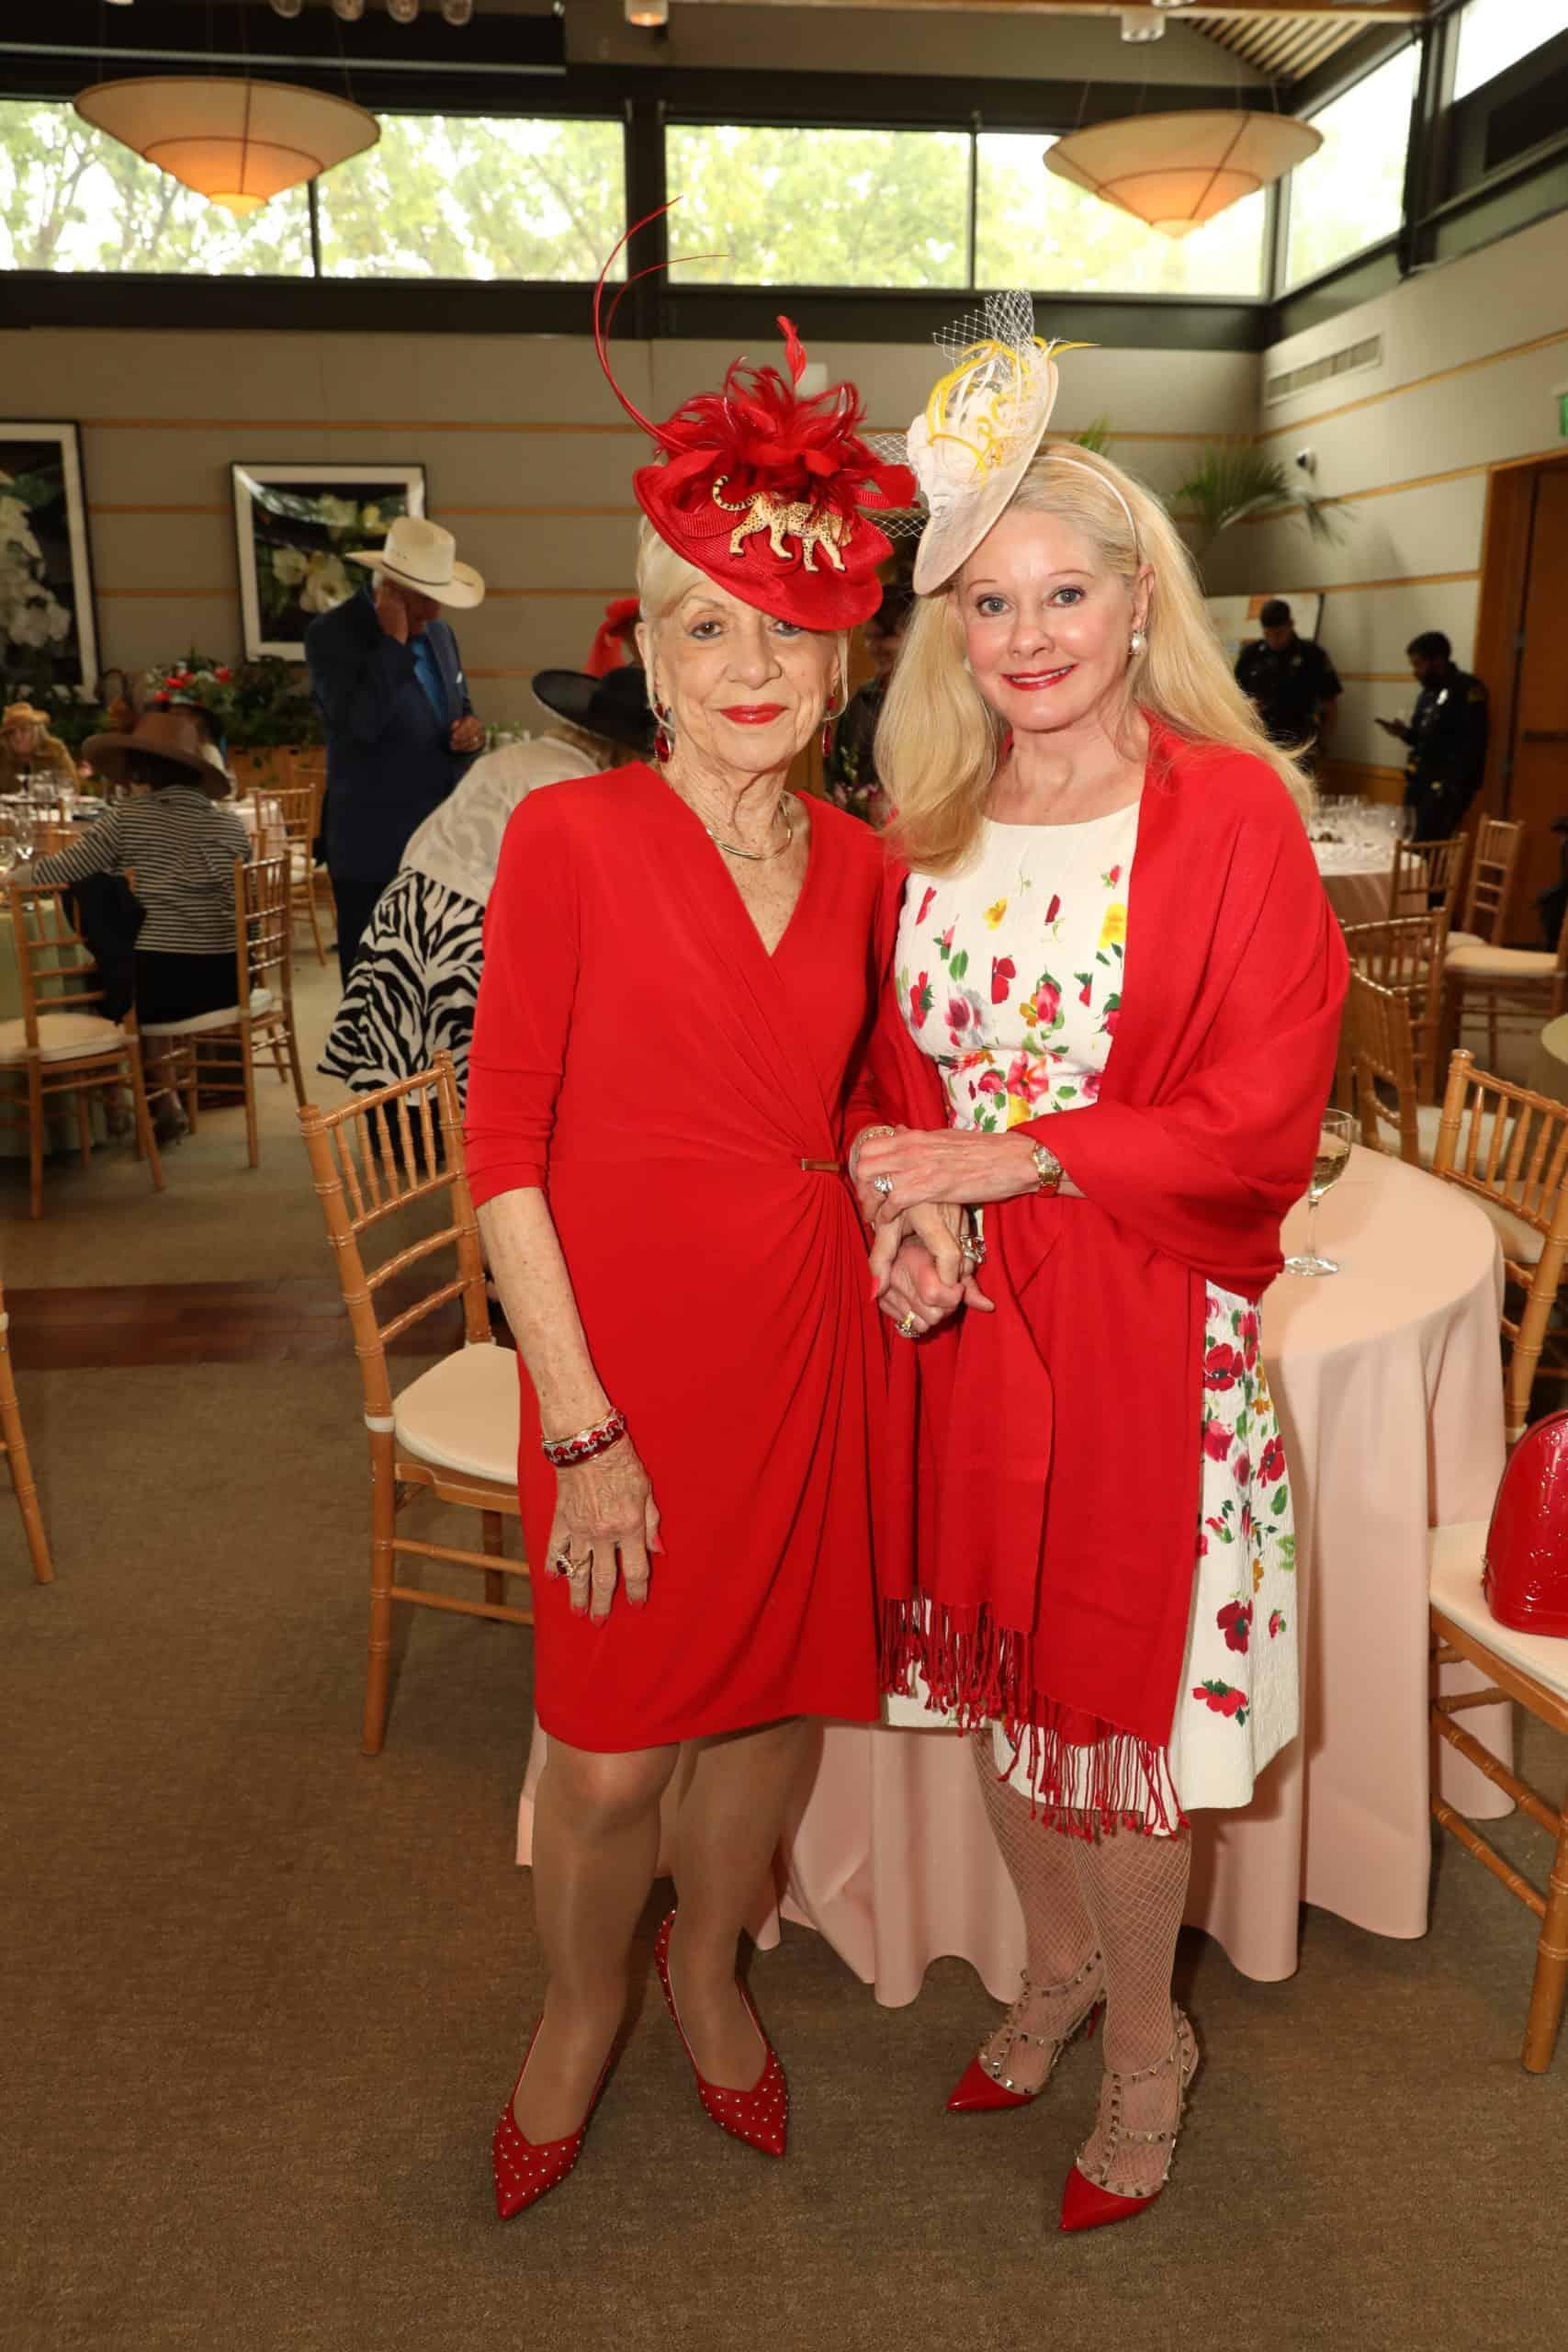 Barbara Bigham and Dyann Skelton